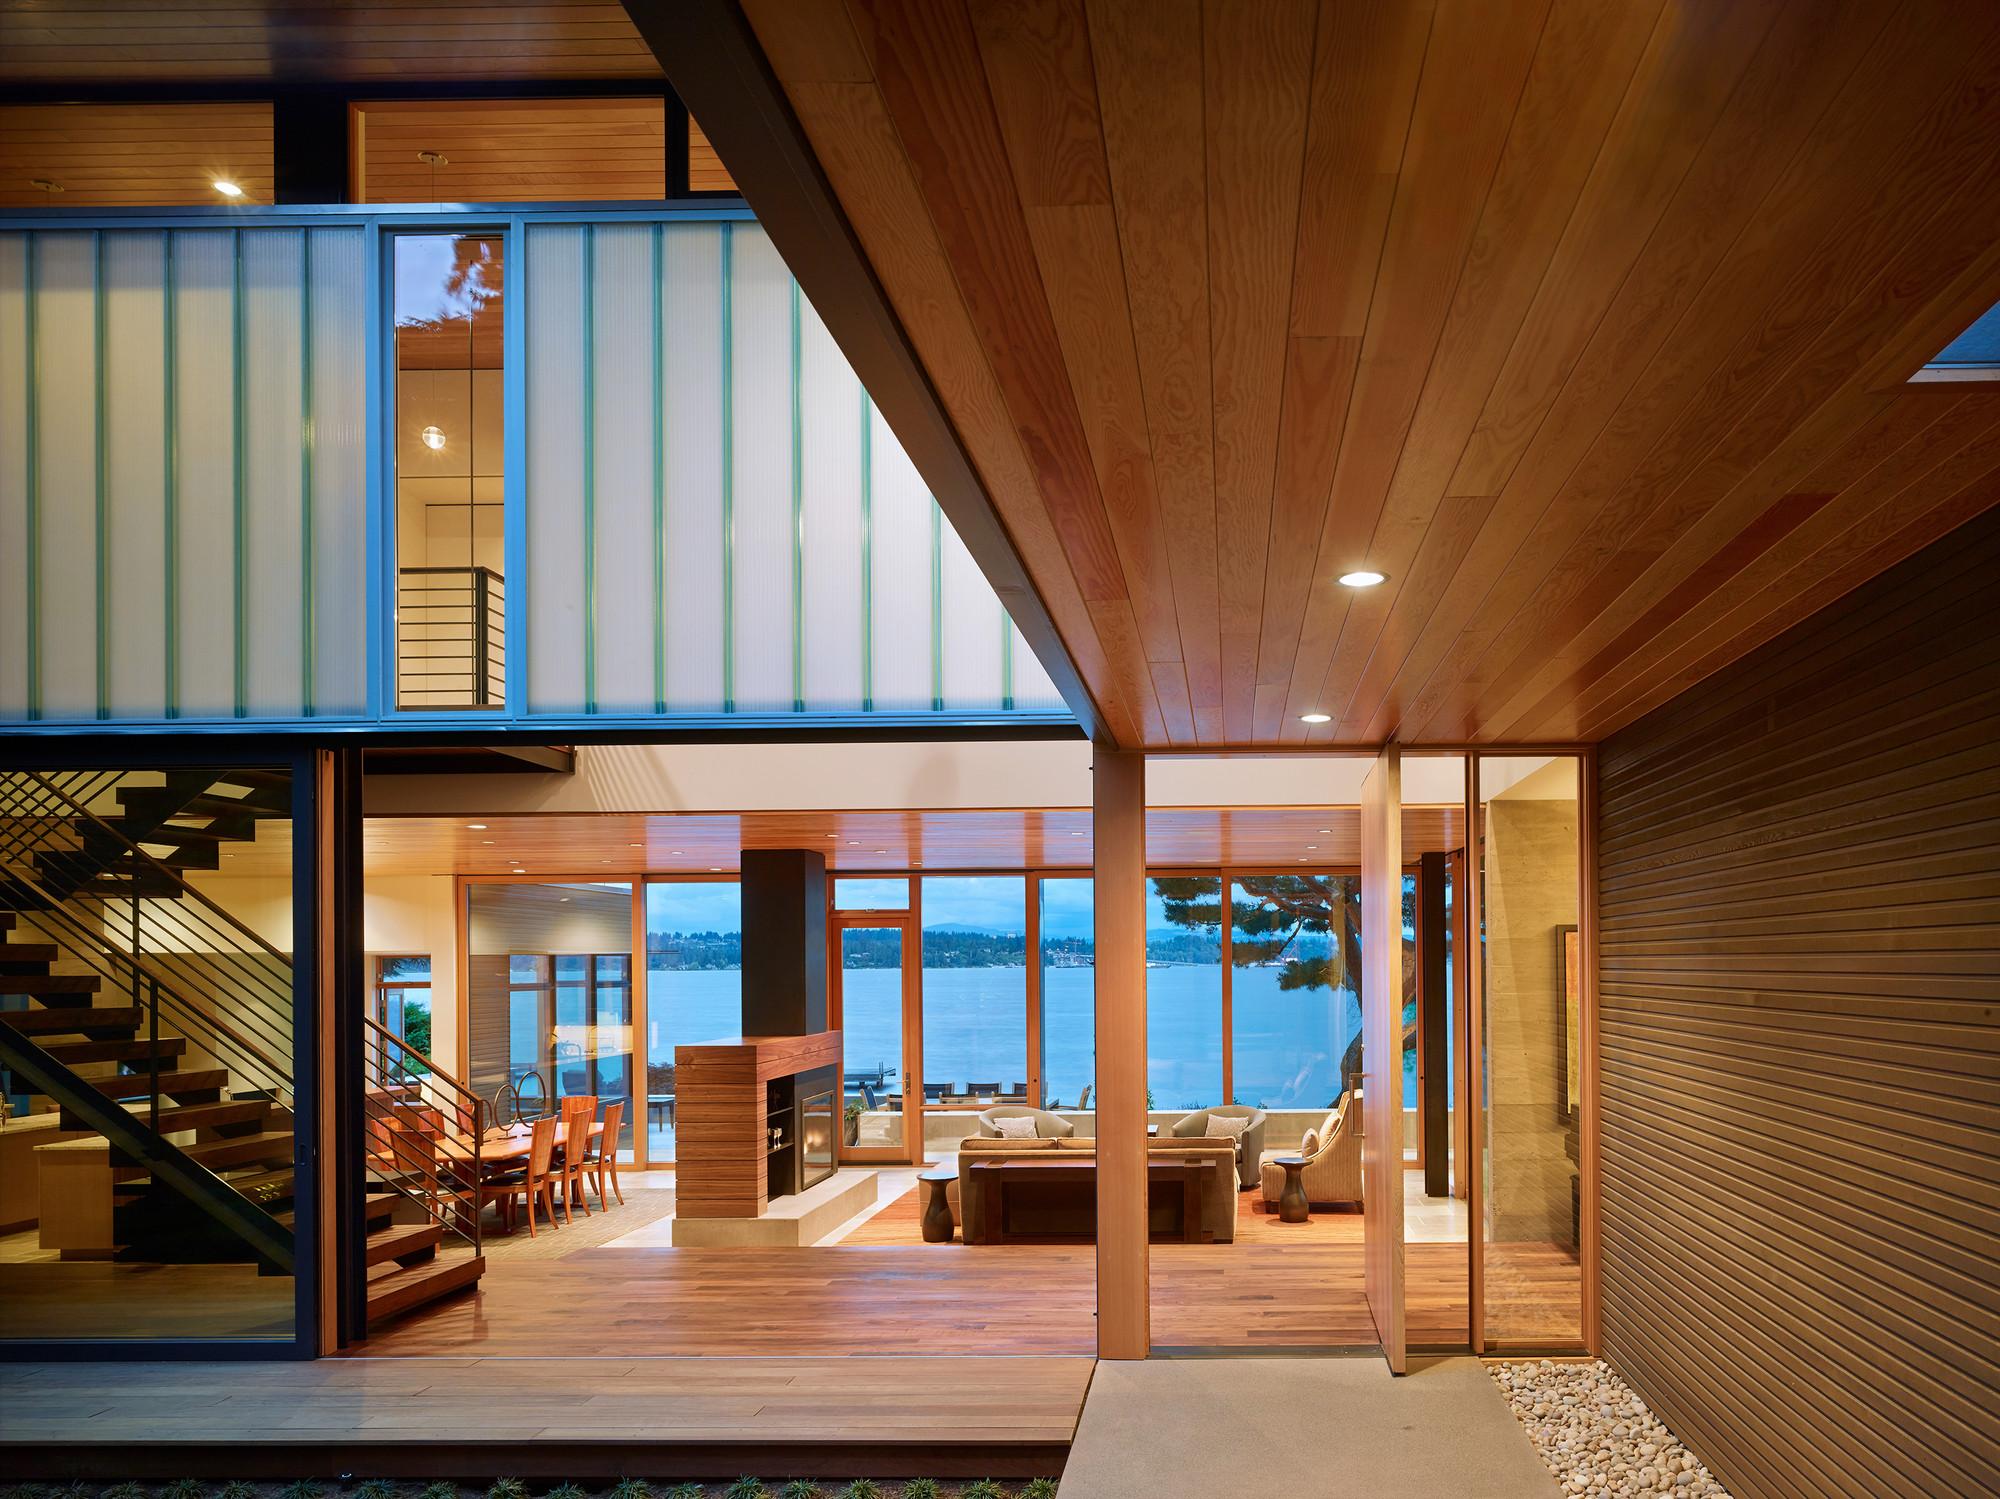 Courtyard House / DeForest Architects